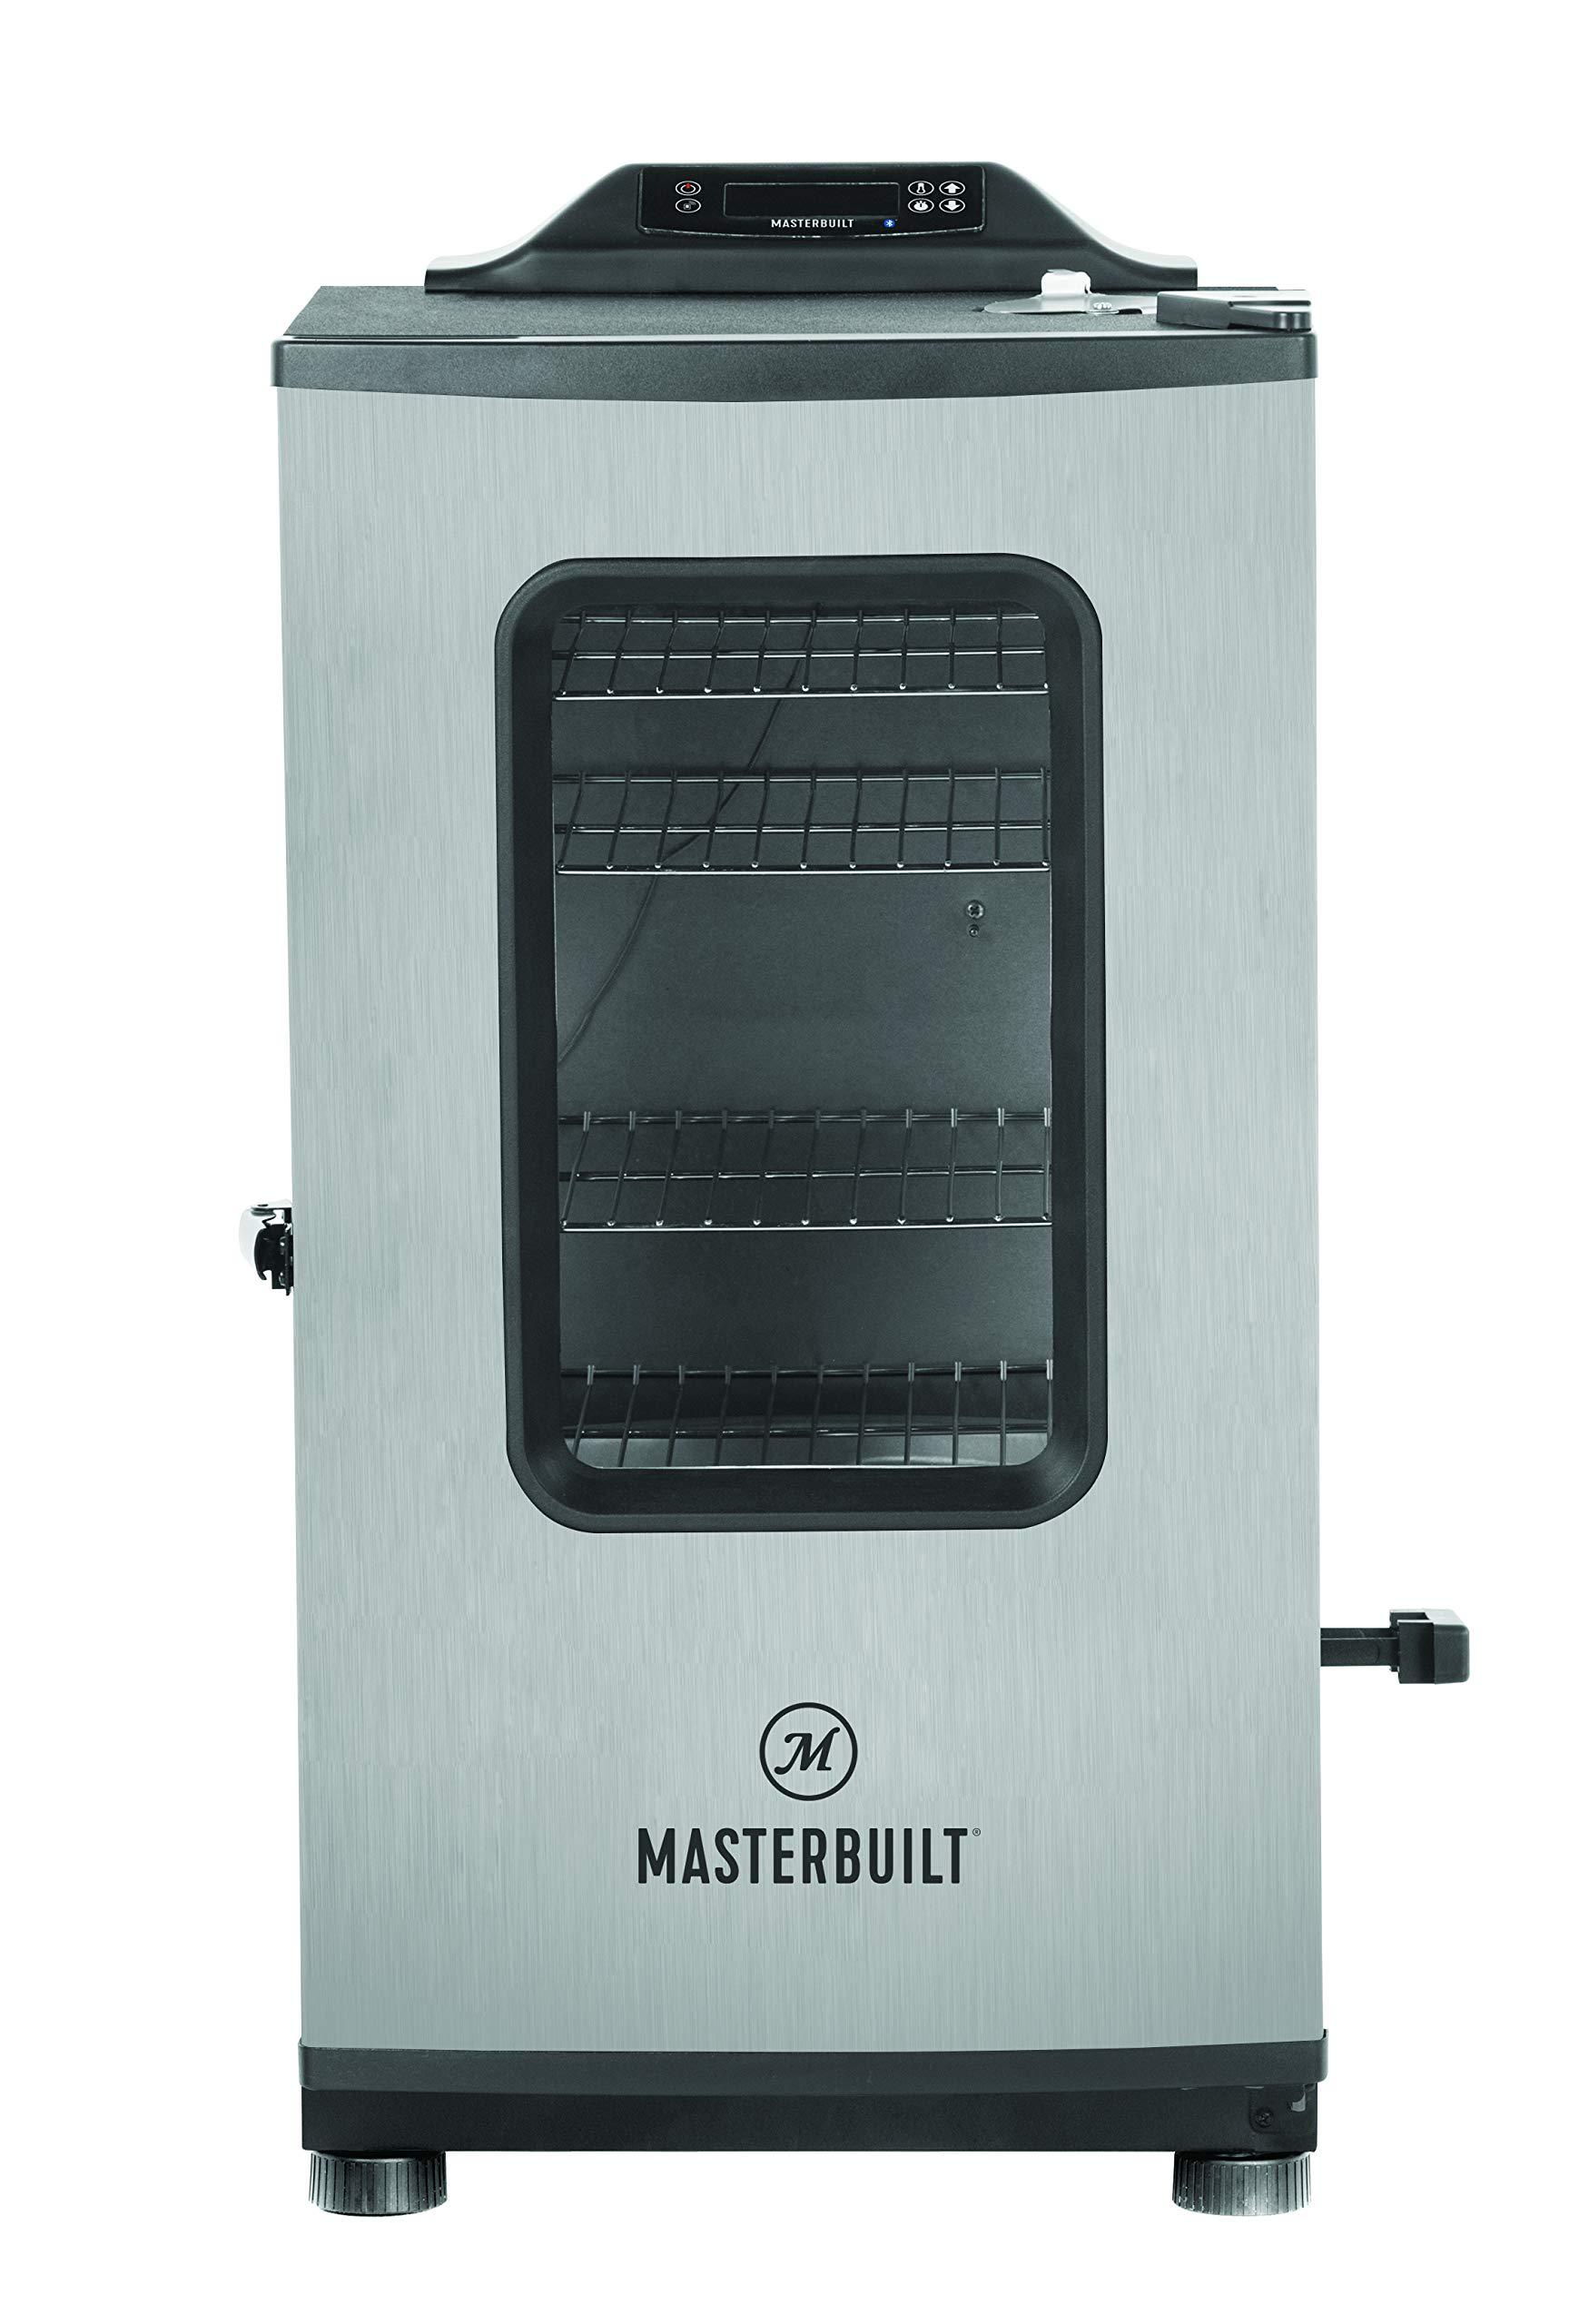 Masterbuilt MB20073919 Electric Smoker Stainless